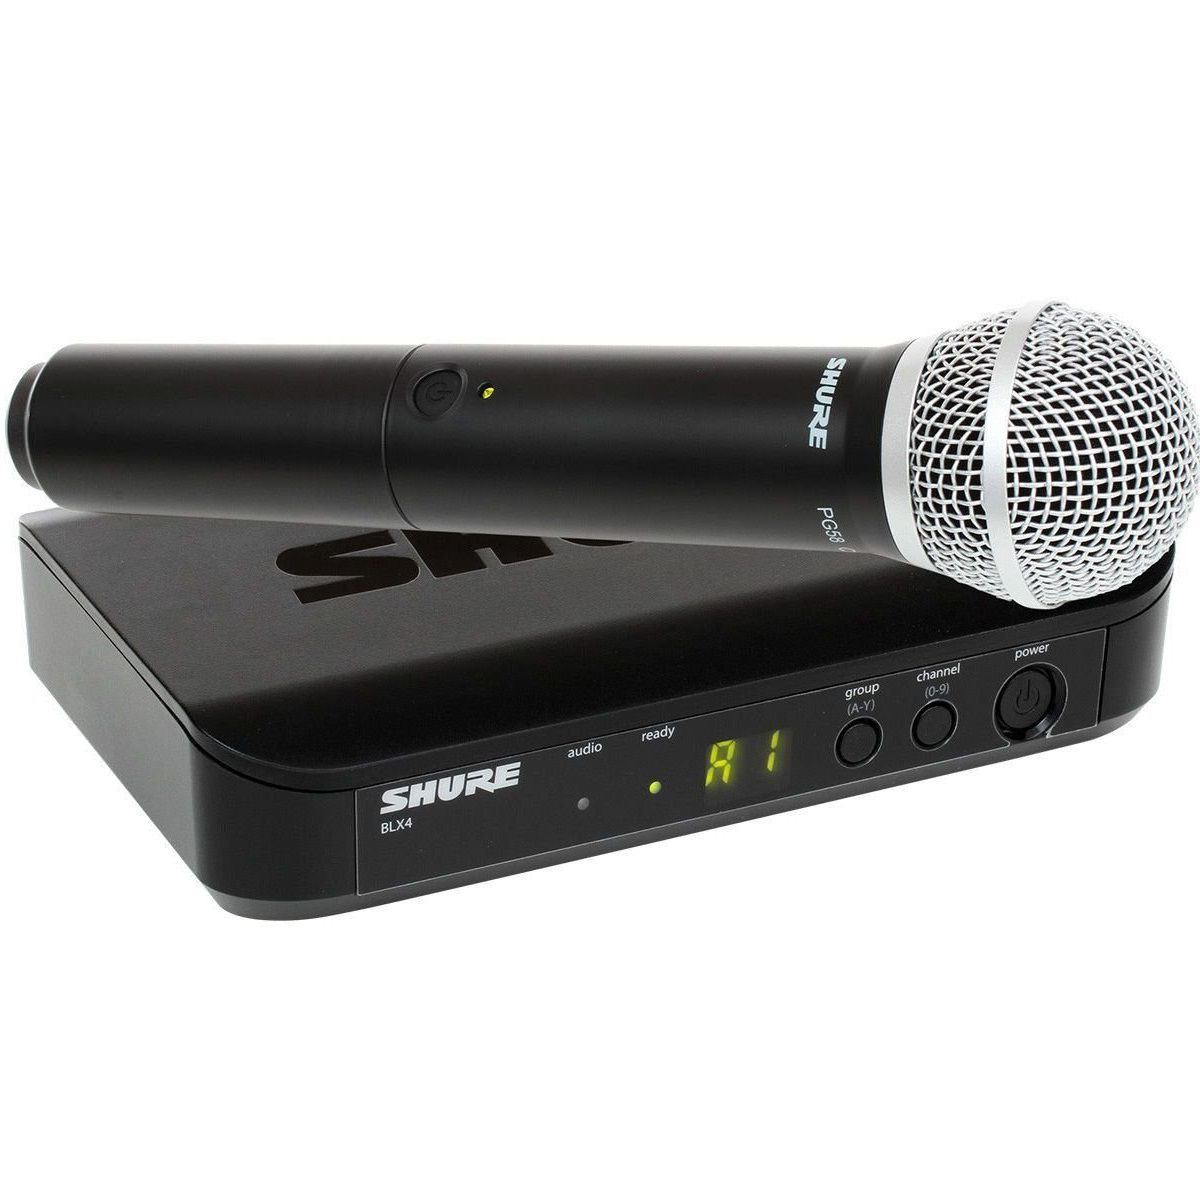 Microfone Shure Sem Fio Profissional Blx24br Pg58 J10